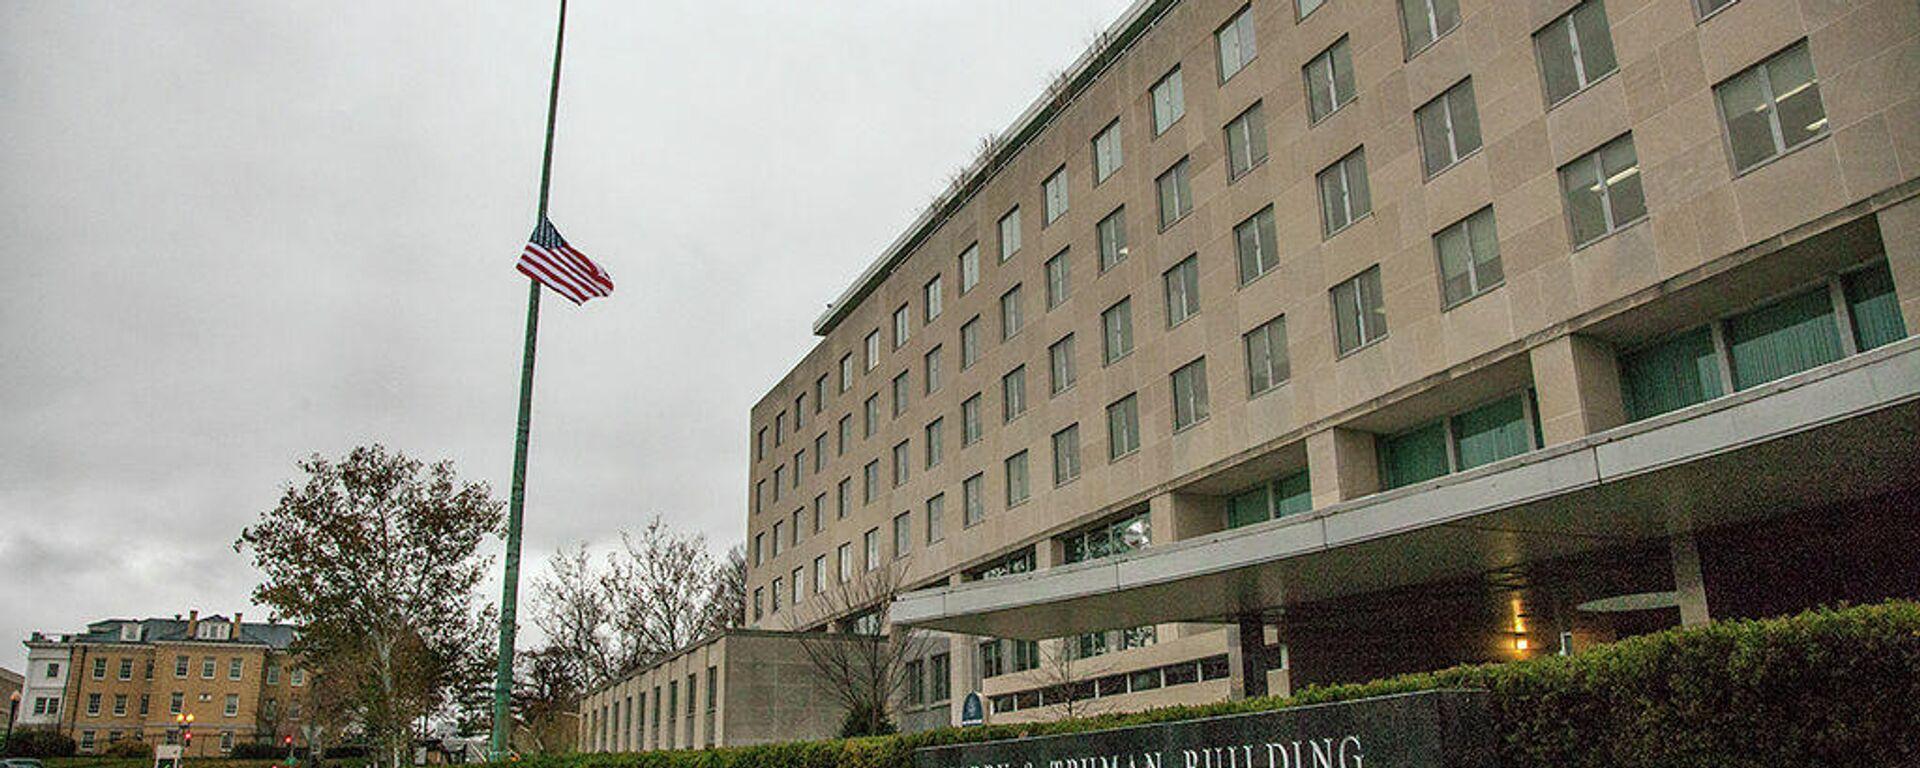 US-Außenministerium in Washington (Archivbild) - SNA, 1920, 27.04.2021